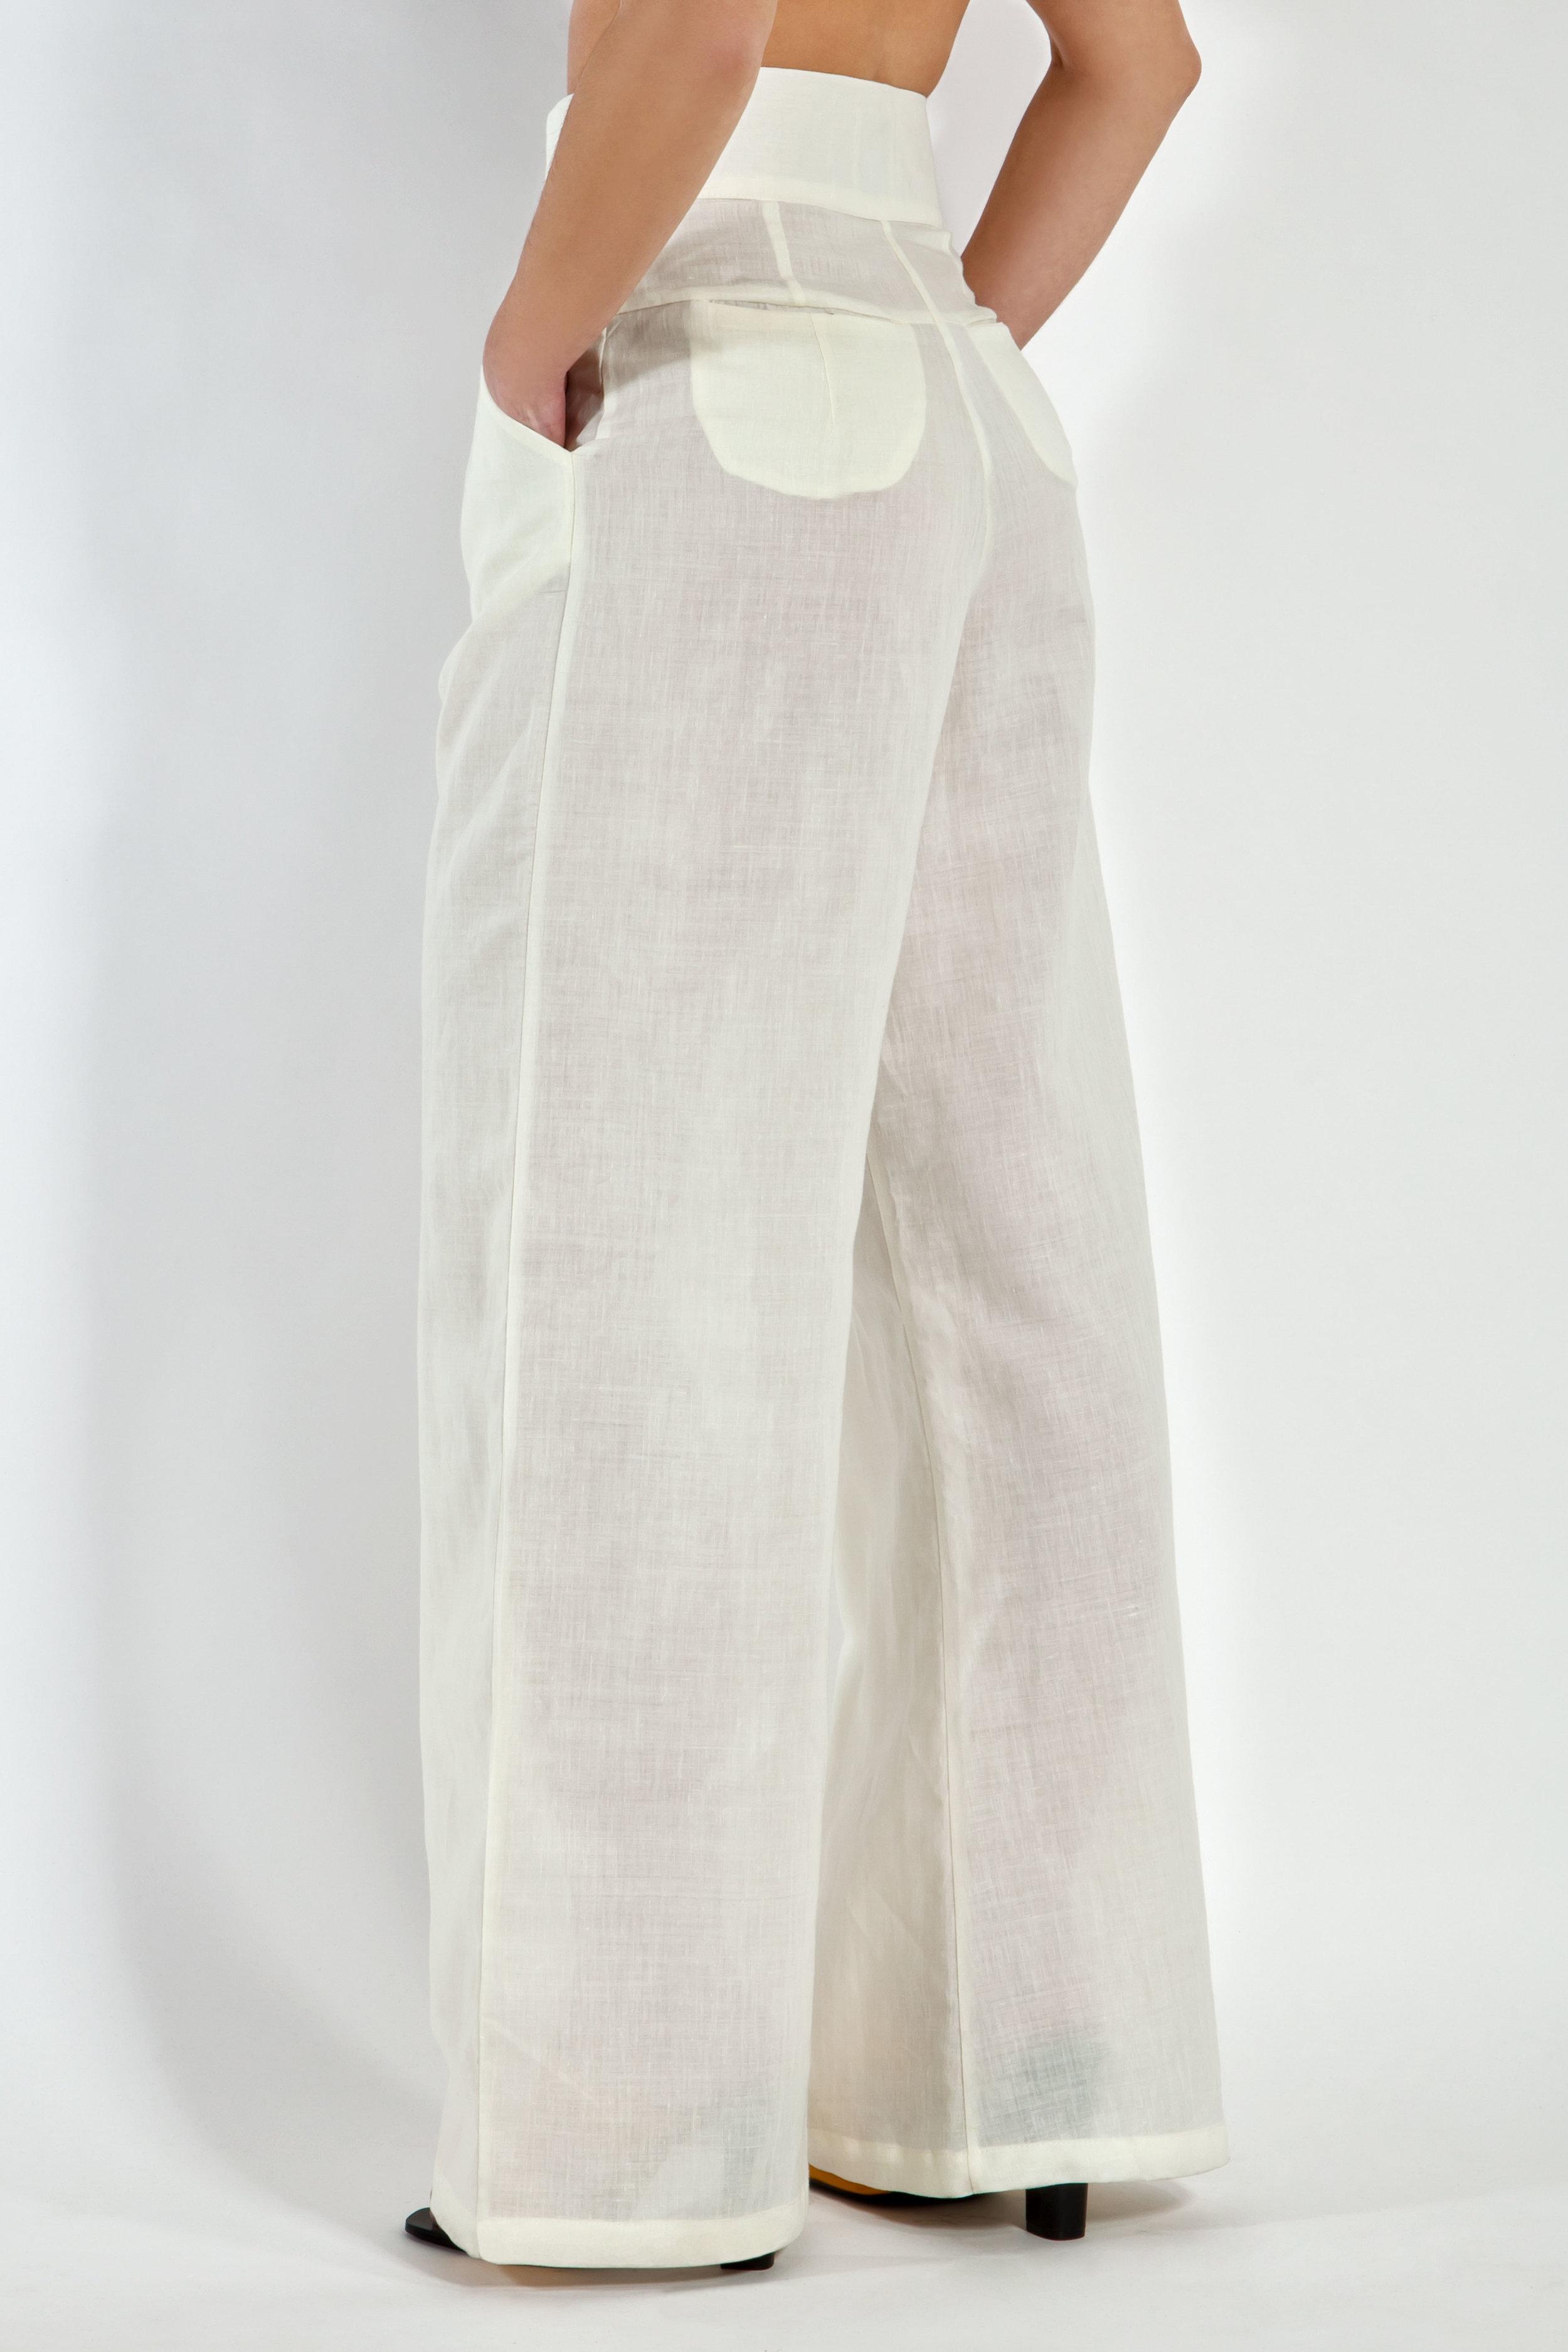 White Linen Trousers